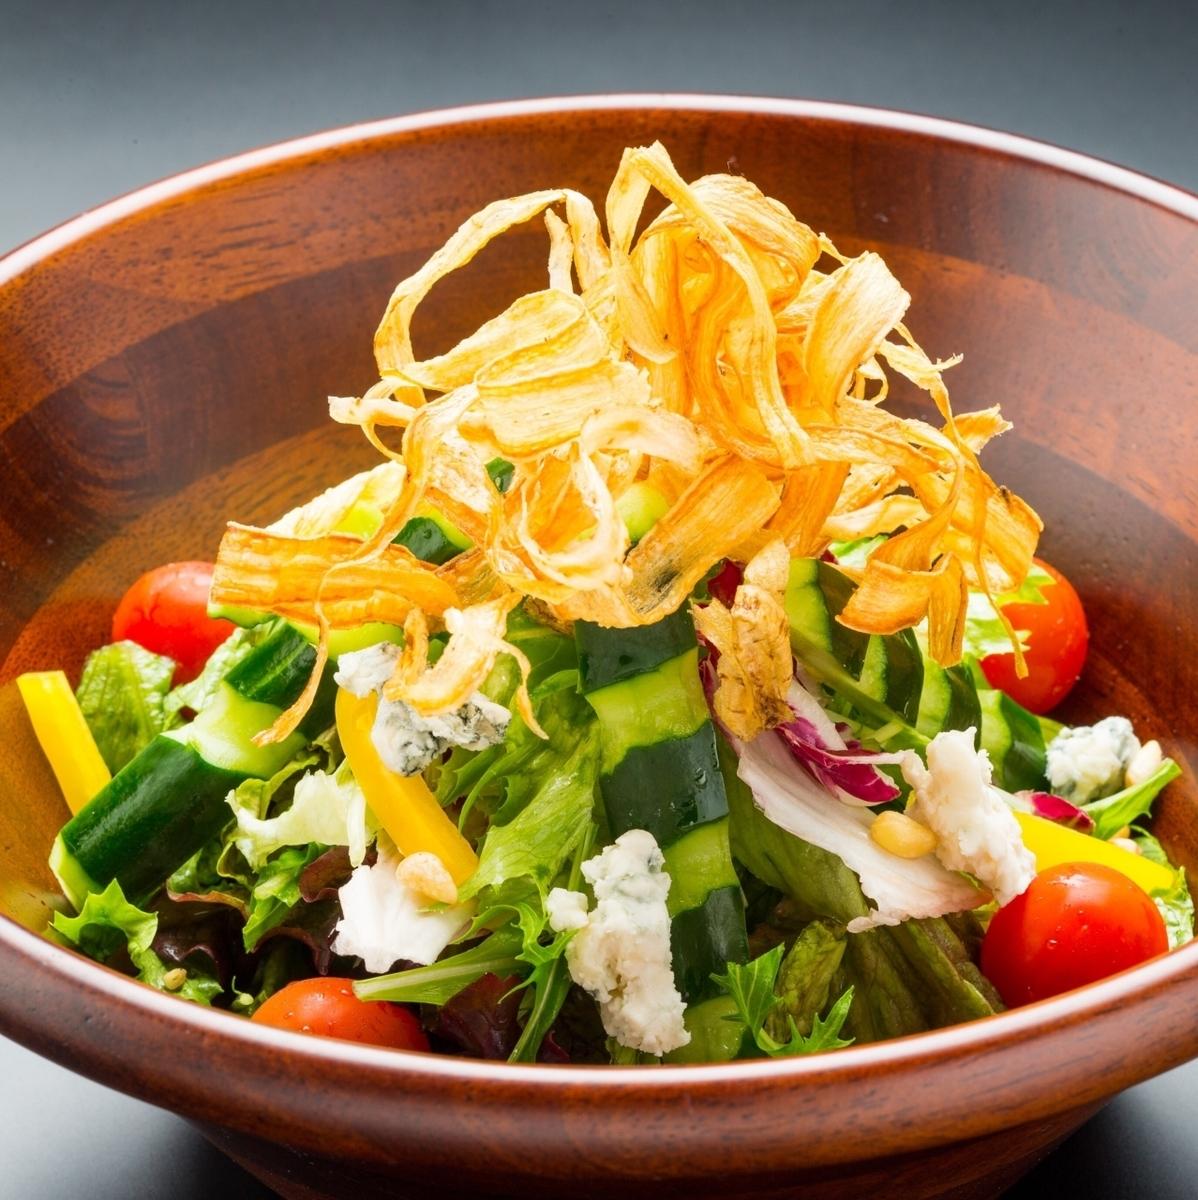 Shakijaki health salad (2 to 3 servings)